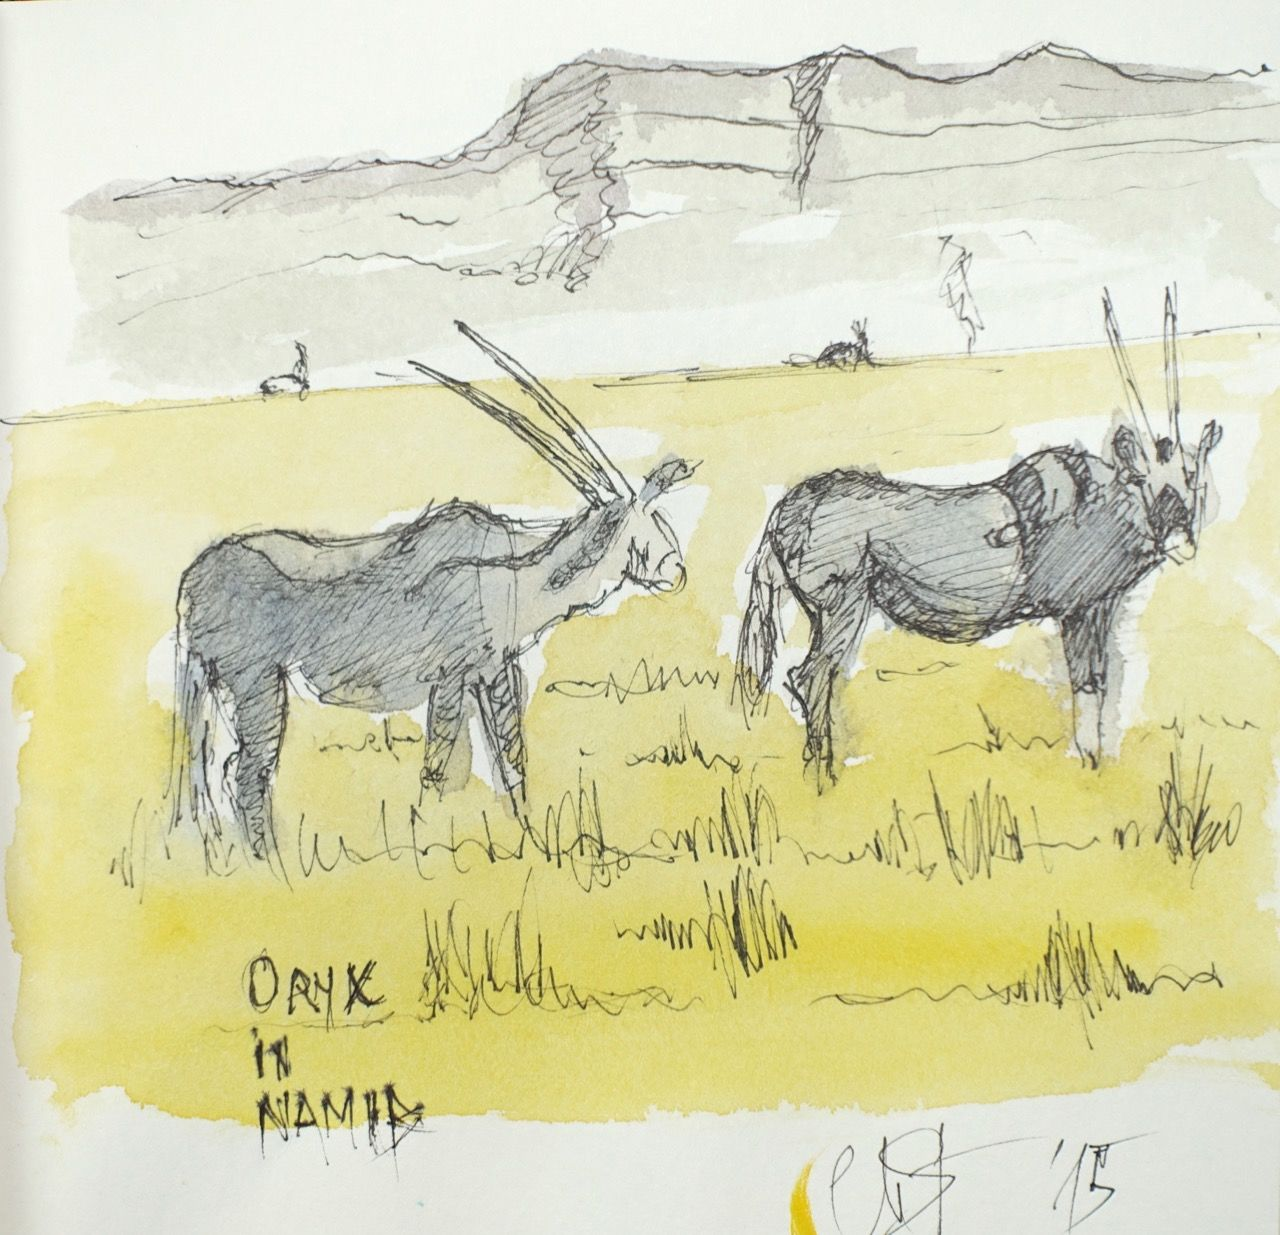 Antilopes orix